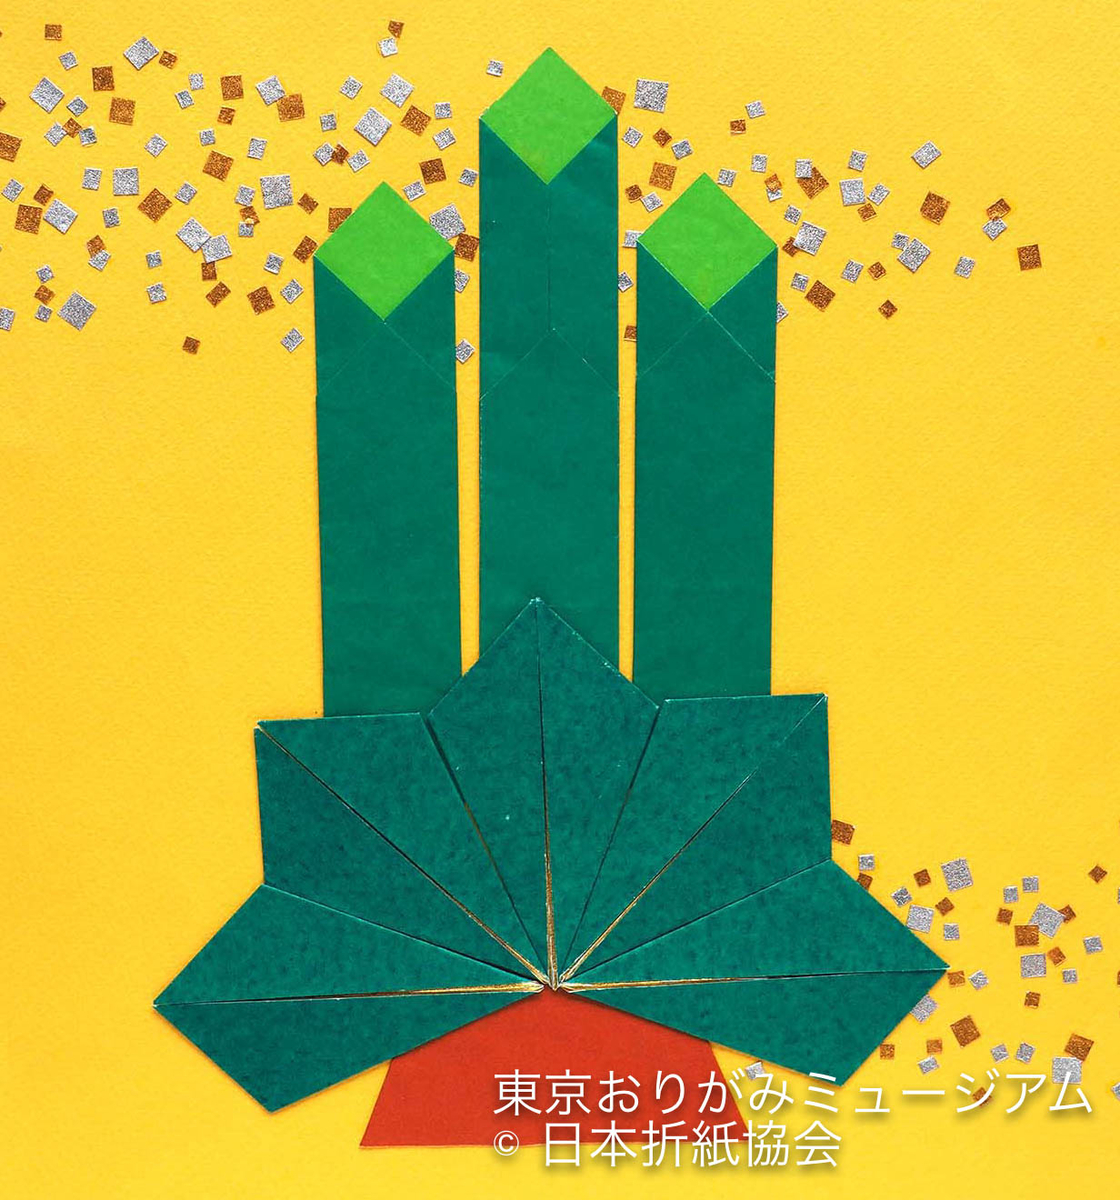 f:id:origami-noa:20200107181803j:plain